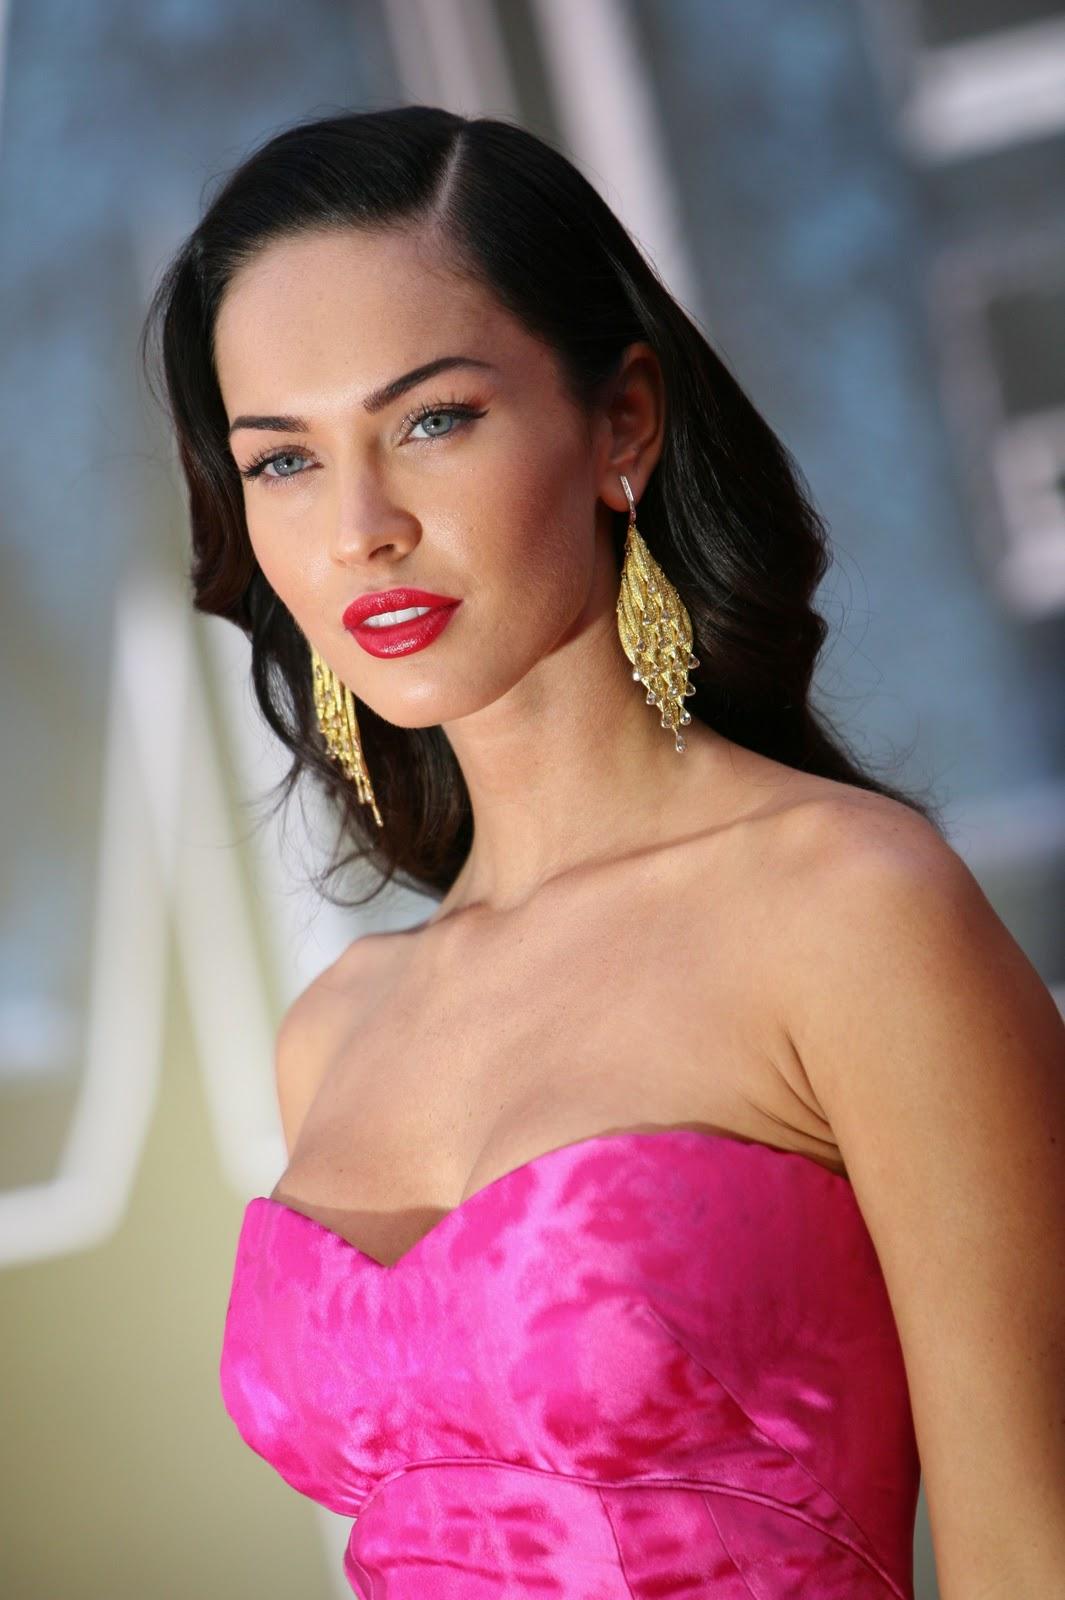 Fashion/Beauty/Music/Celebrities/Me: Beautiful Faces ...